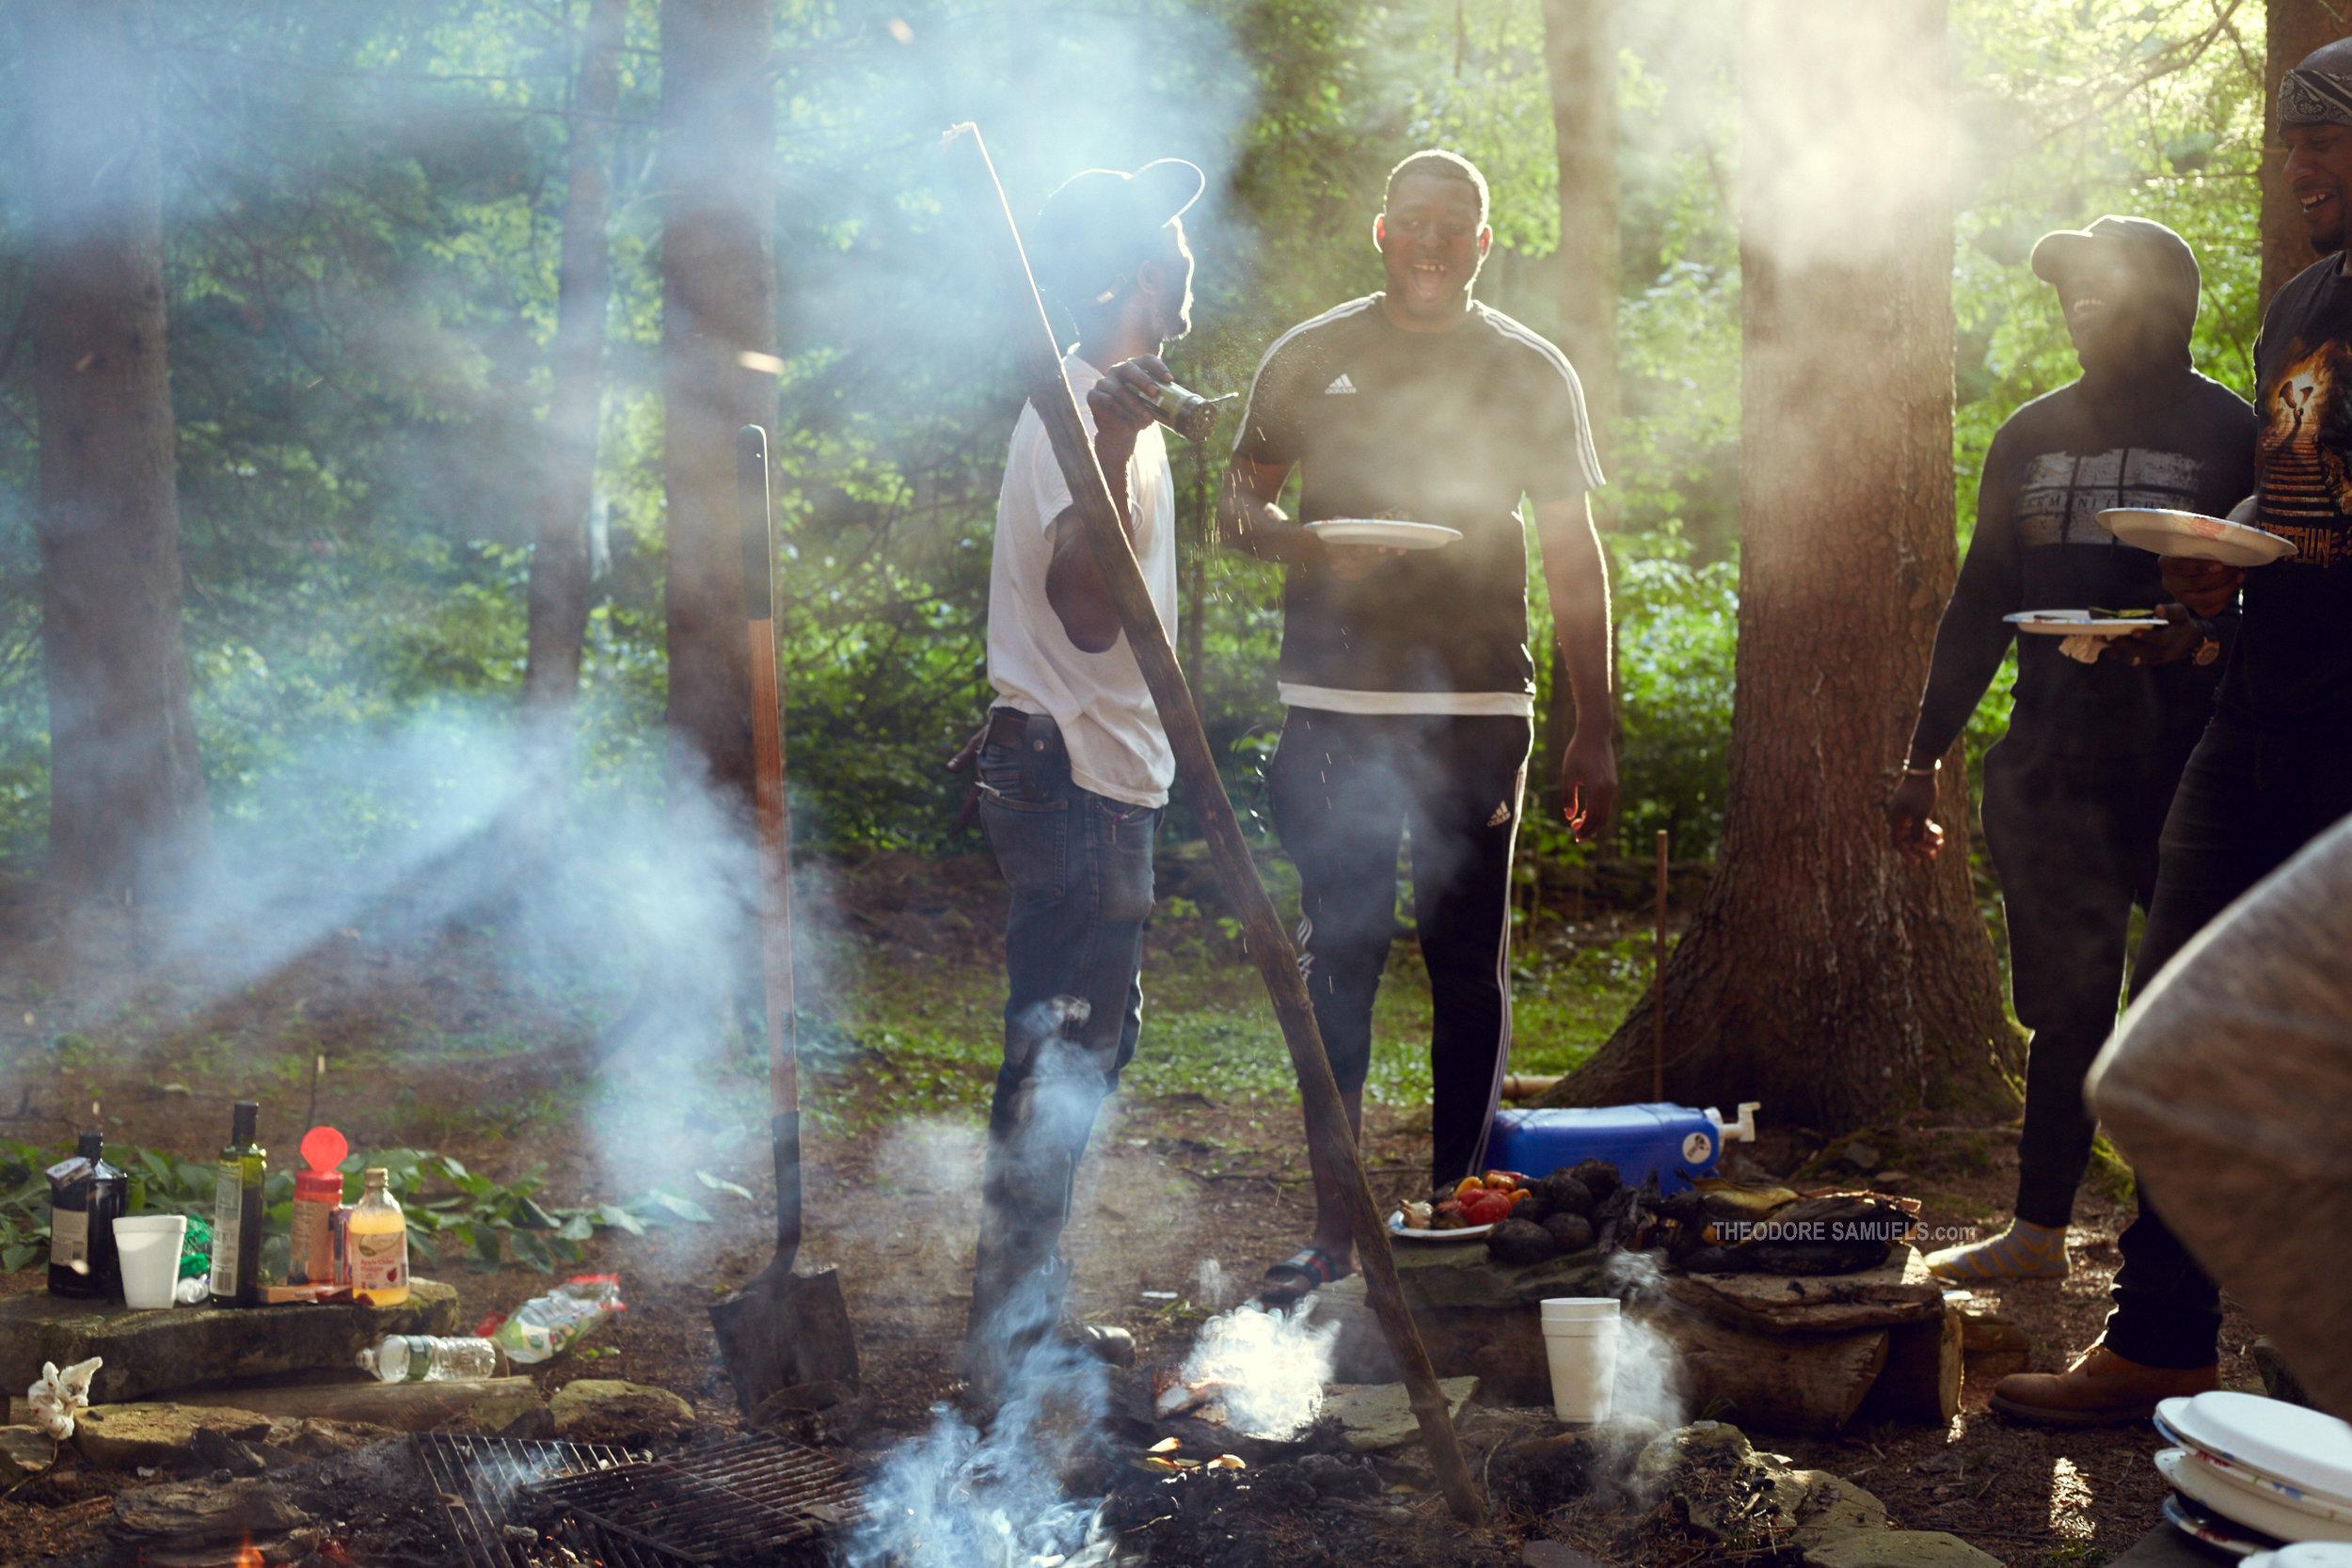 170625_Mastermind Camping_076.jpg